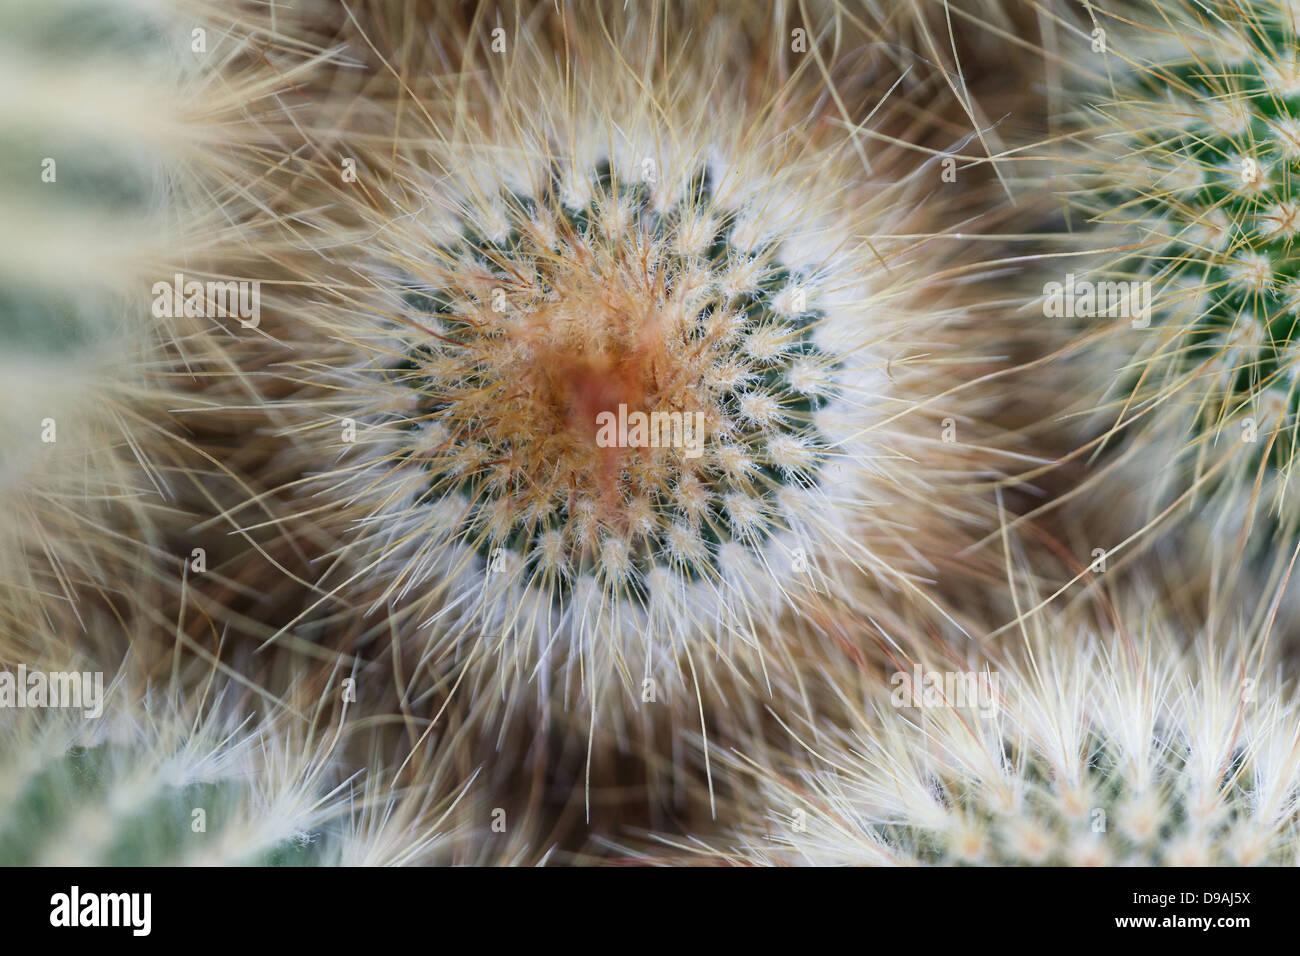 Mammillaria sp cactus montrant la symétrie. Photo Stock